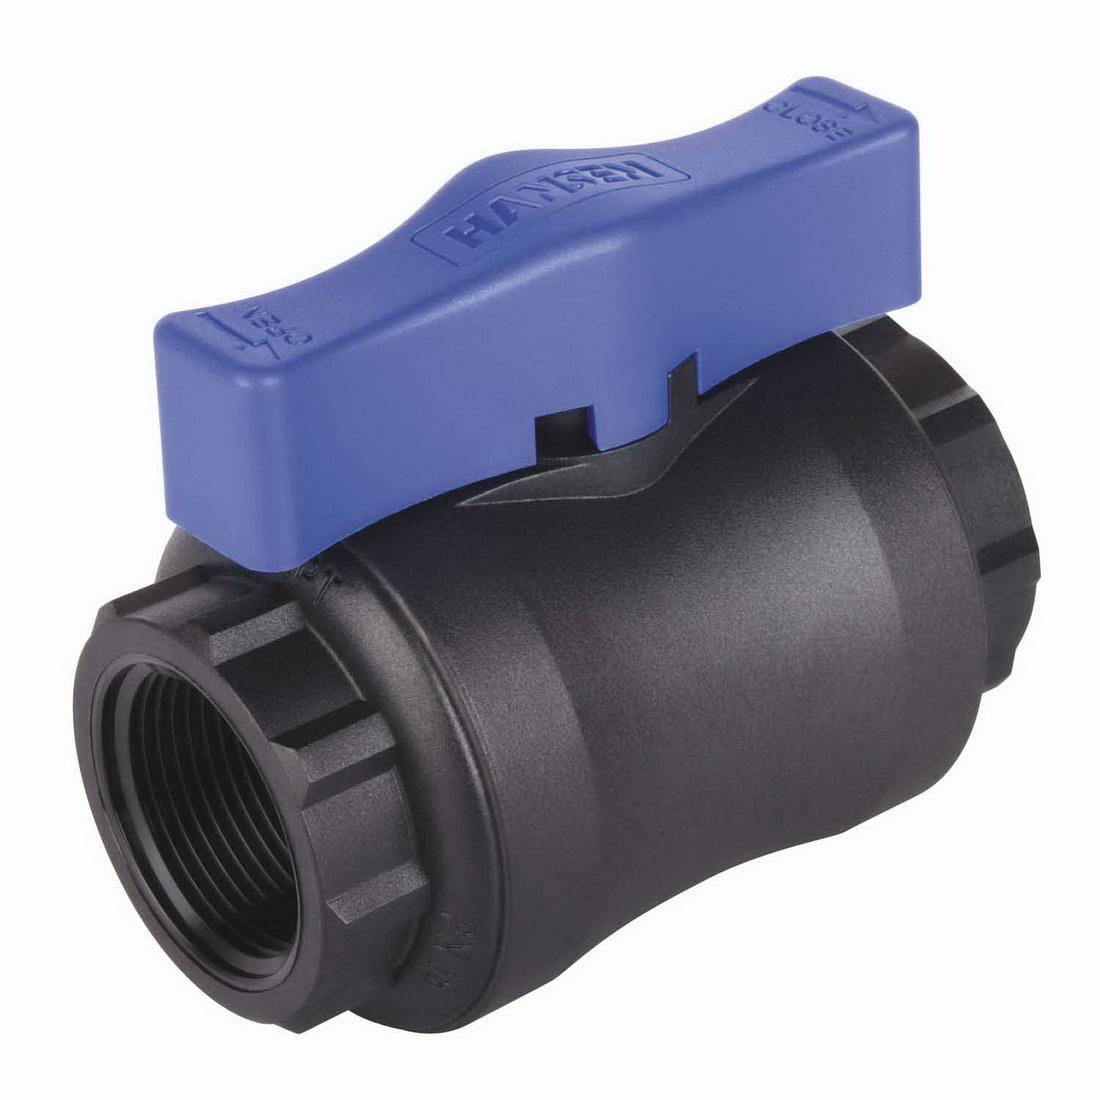 HBV Series Full Flow Compact Ball Valve 25mm F BSPT Glass Fibre Reinforced Nylon Black/Blue